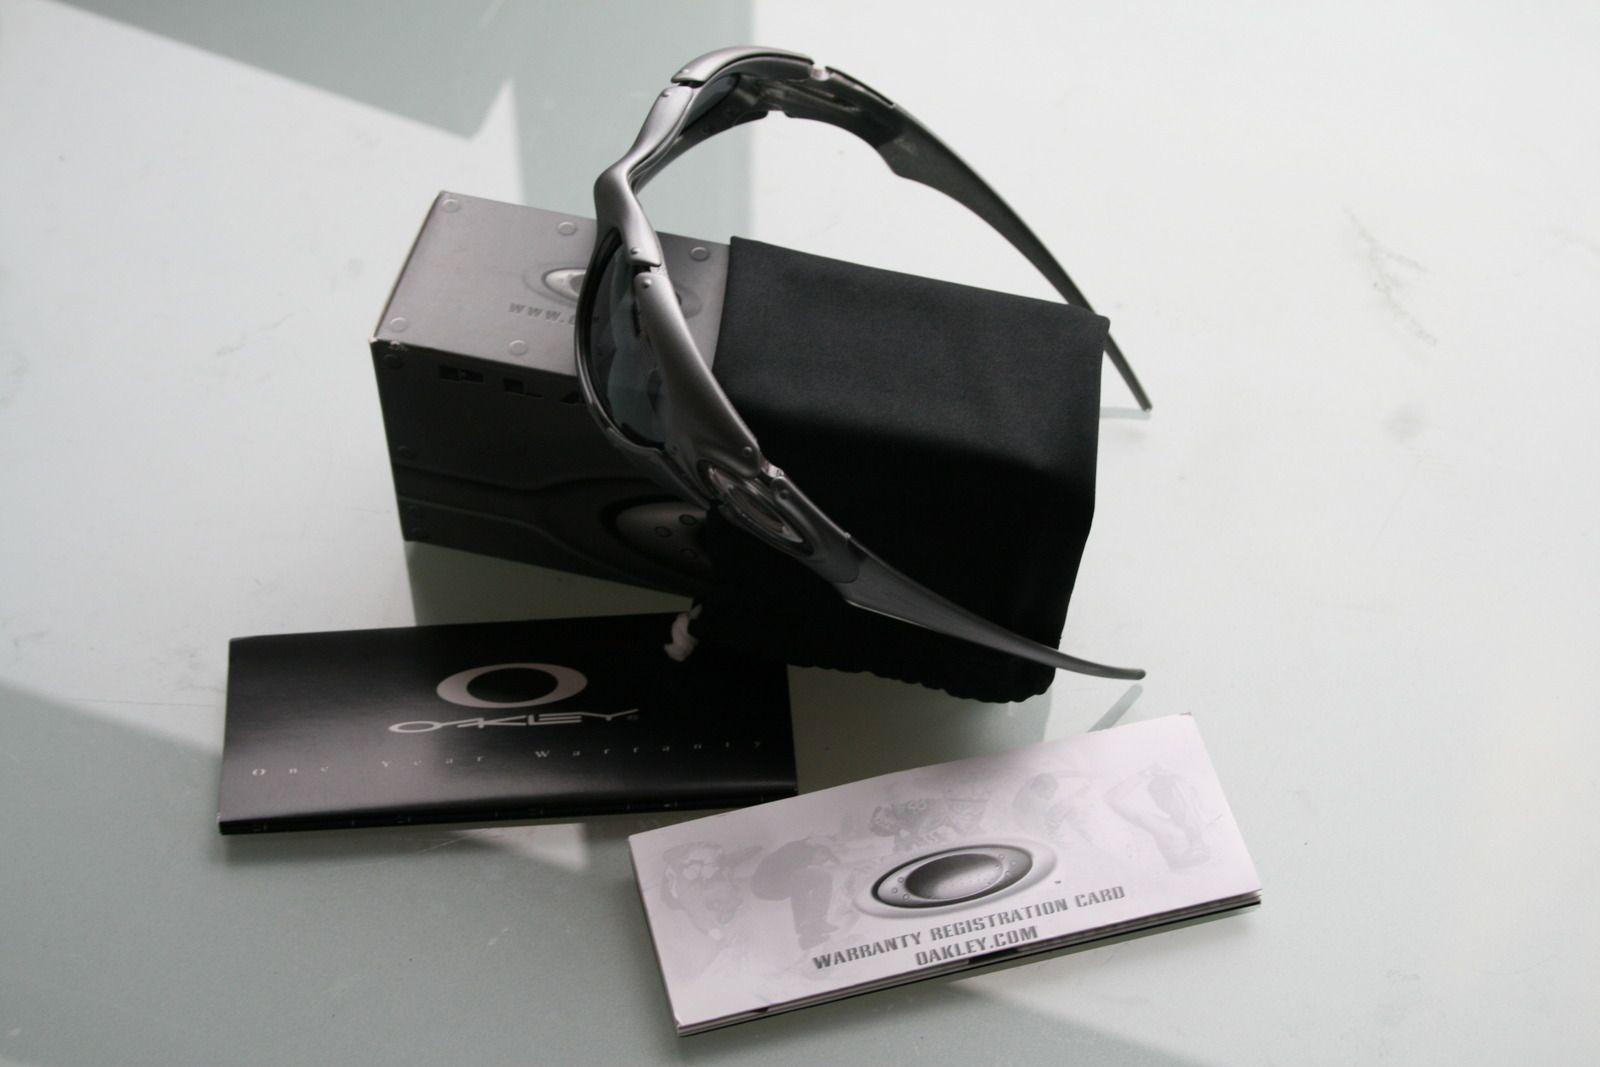 Oakley Dark Silver Black Iridium Lens BNIB SKU# 03-850 - platesilver.jpg